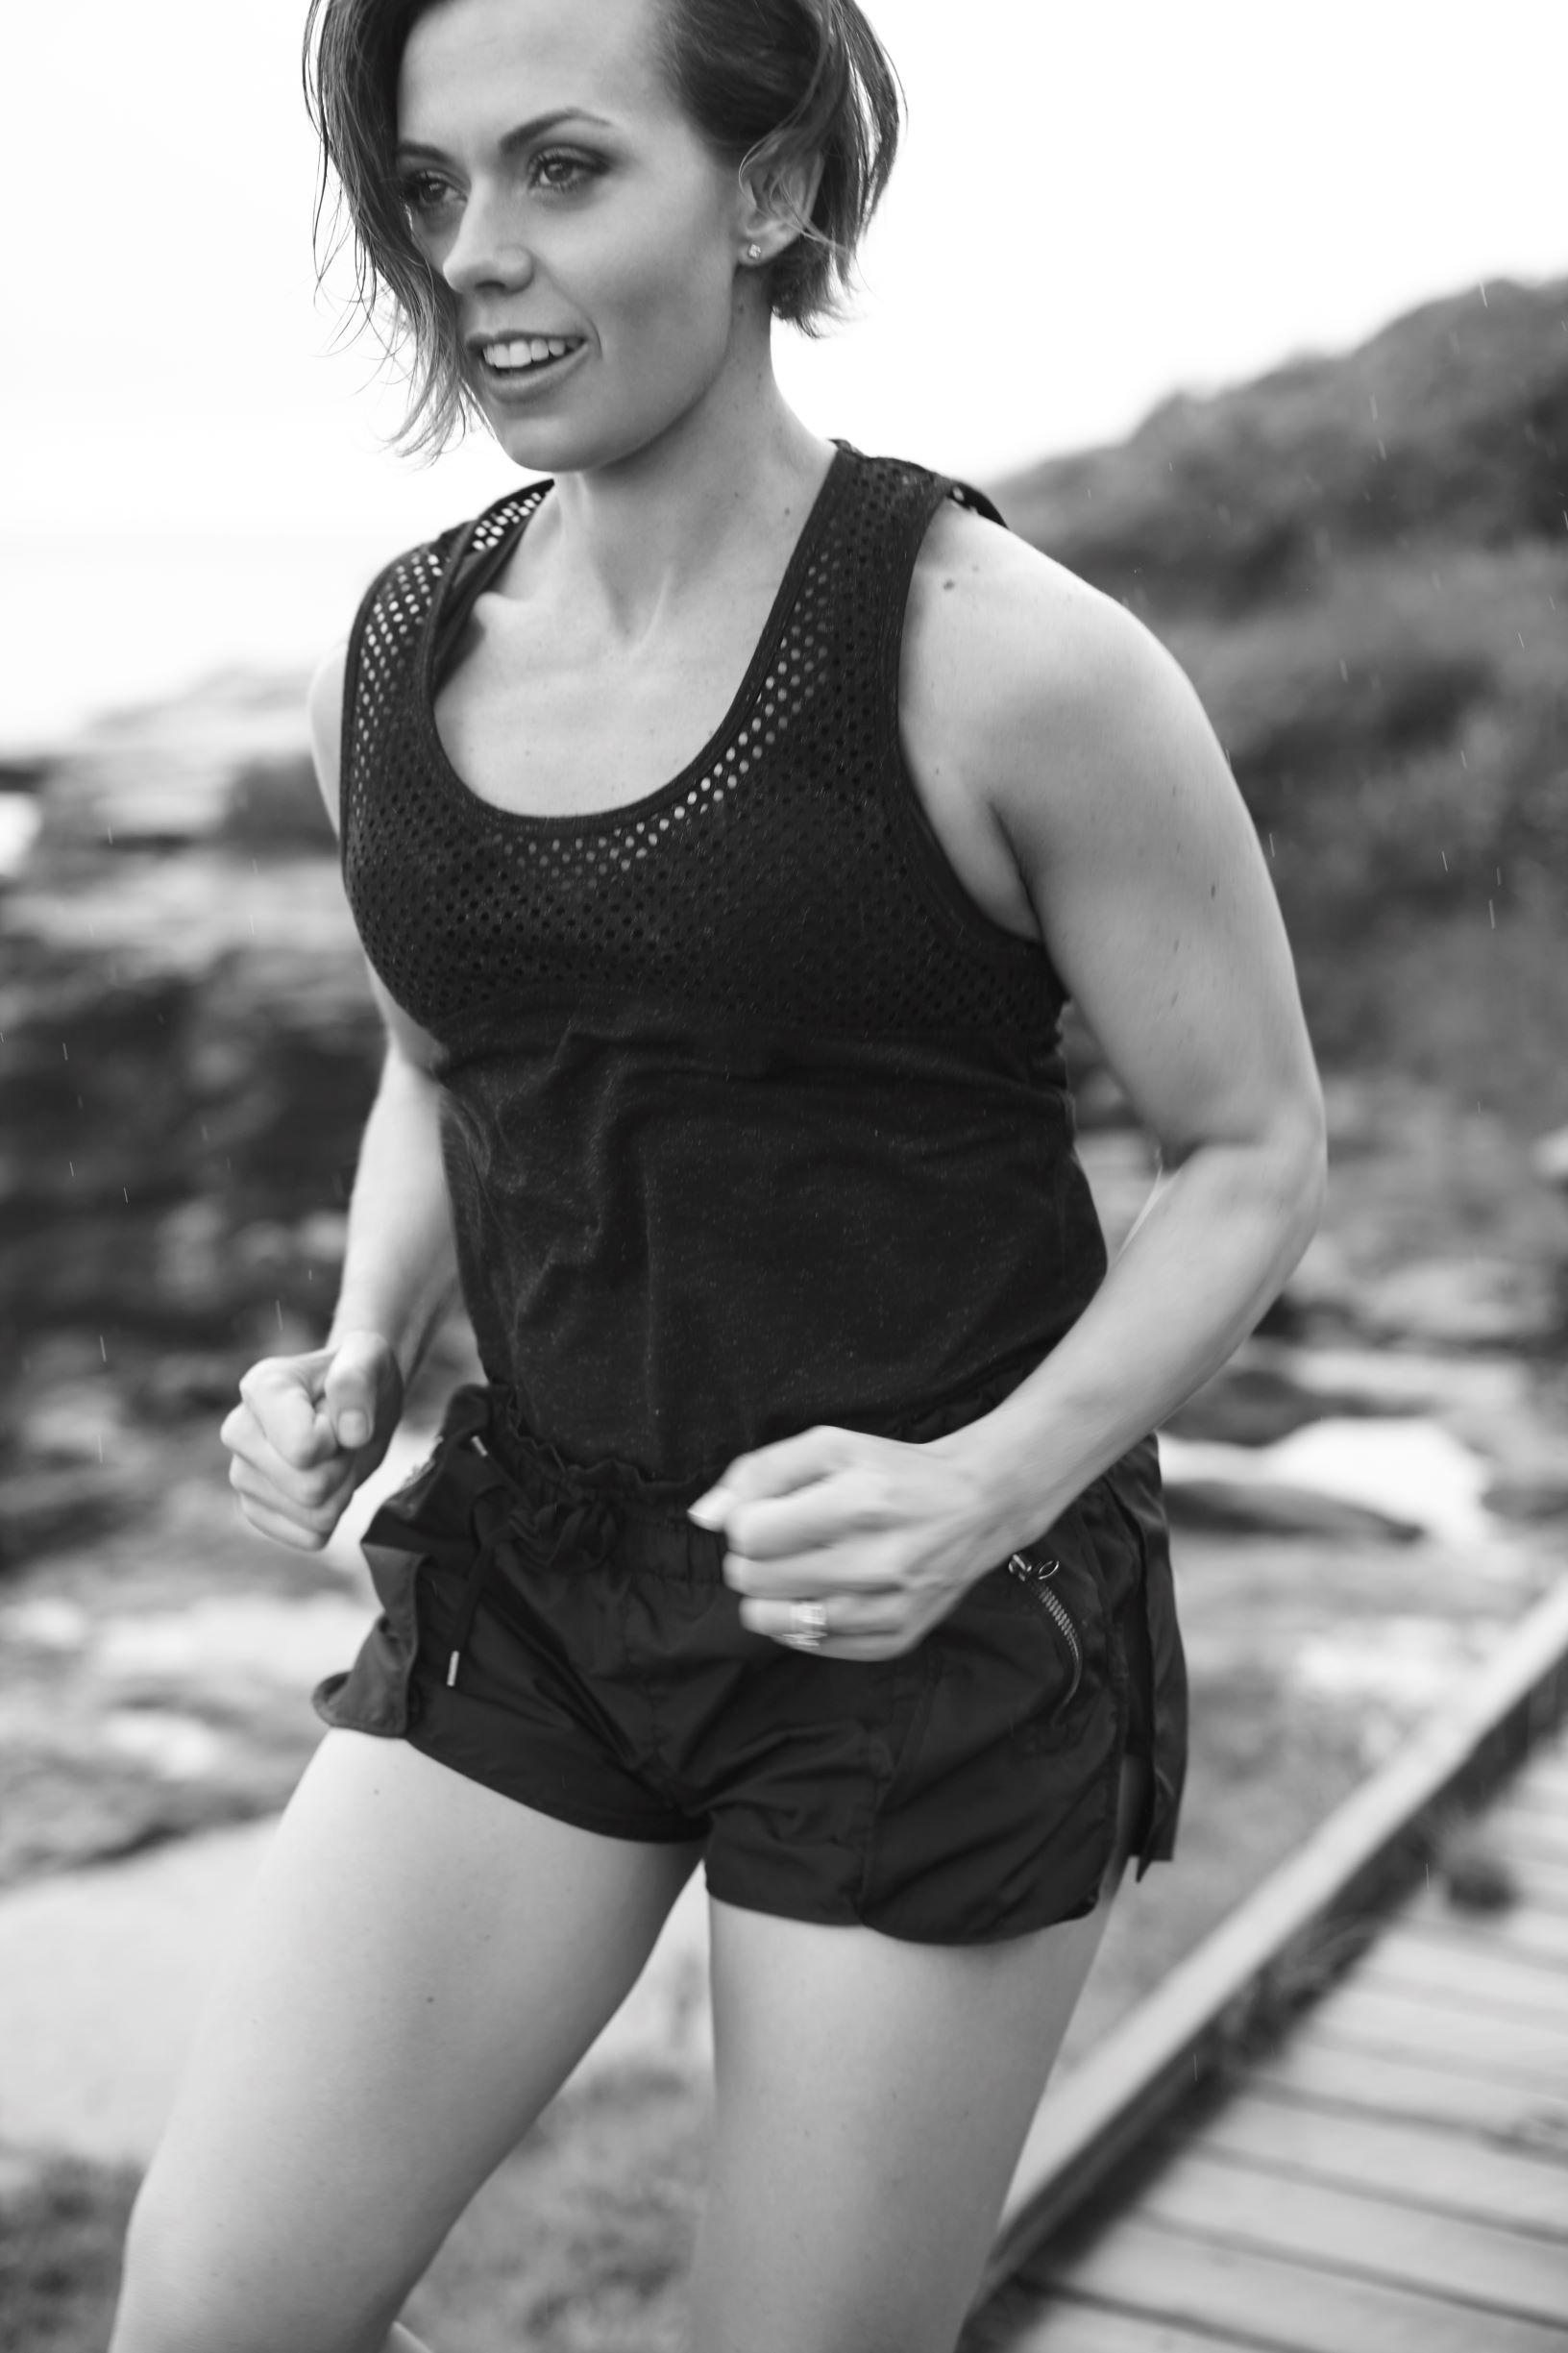 dahlas-bodyfabulous-women's-fitness-trainer-best-pregnancy-trainer-australia